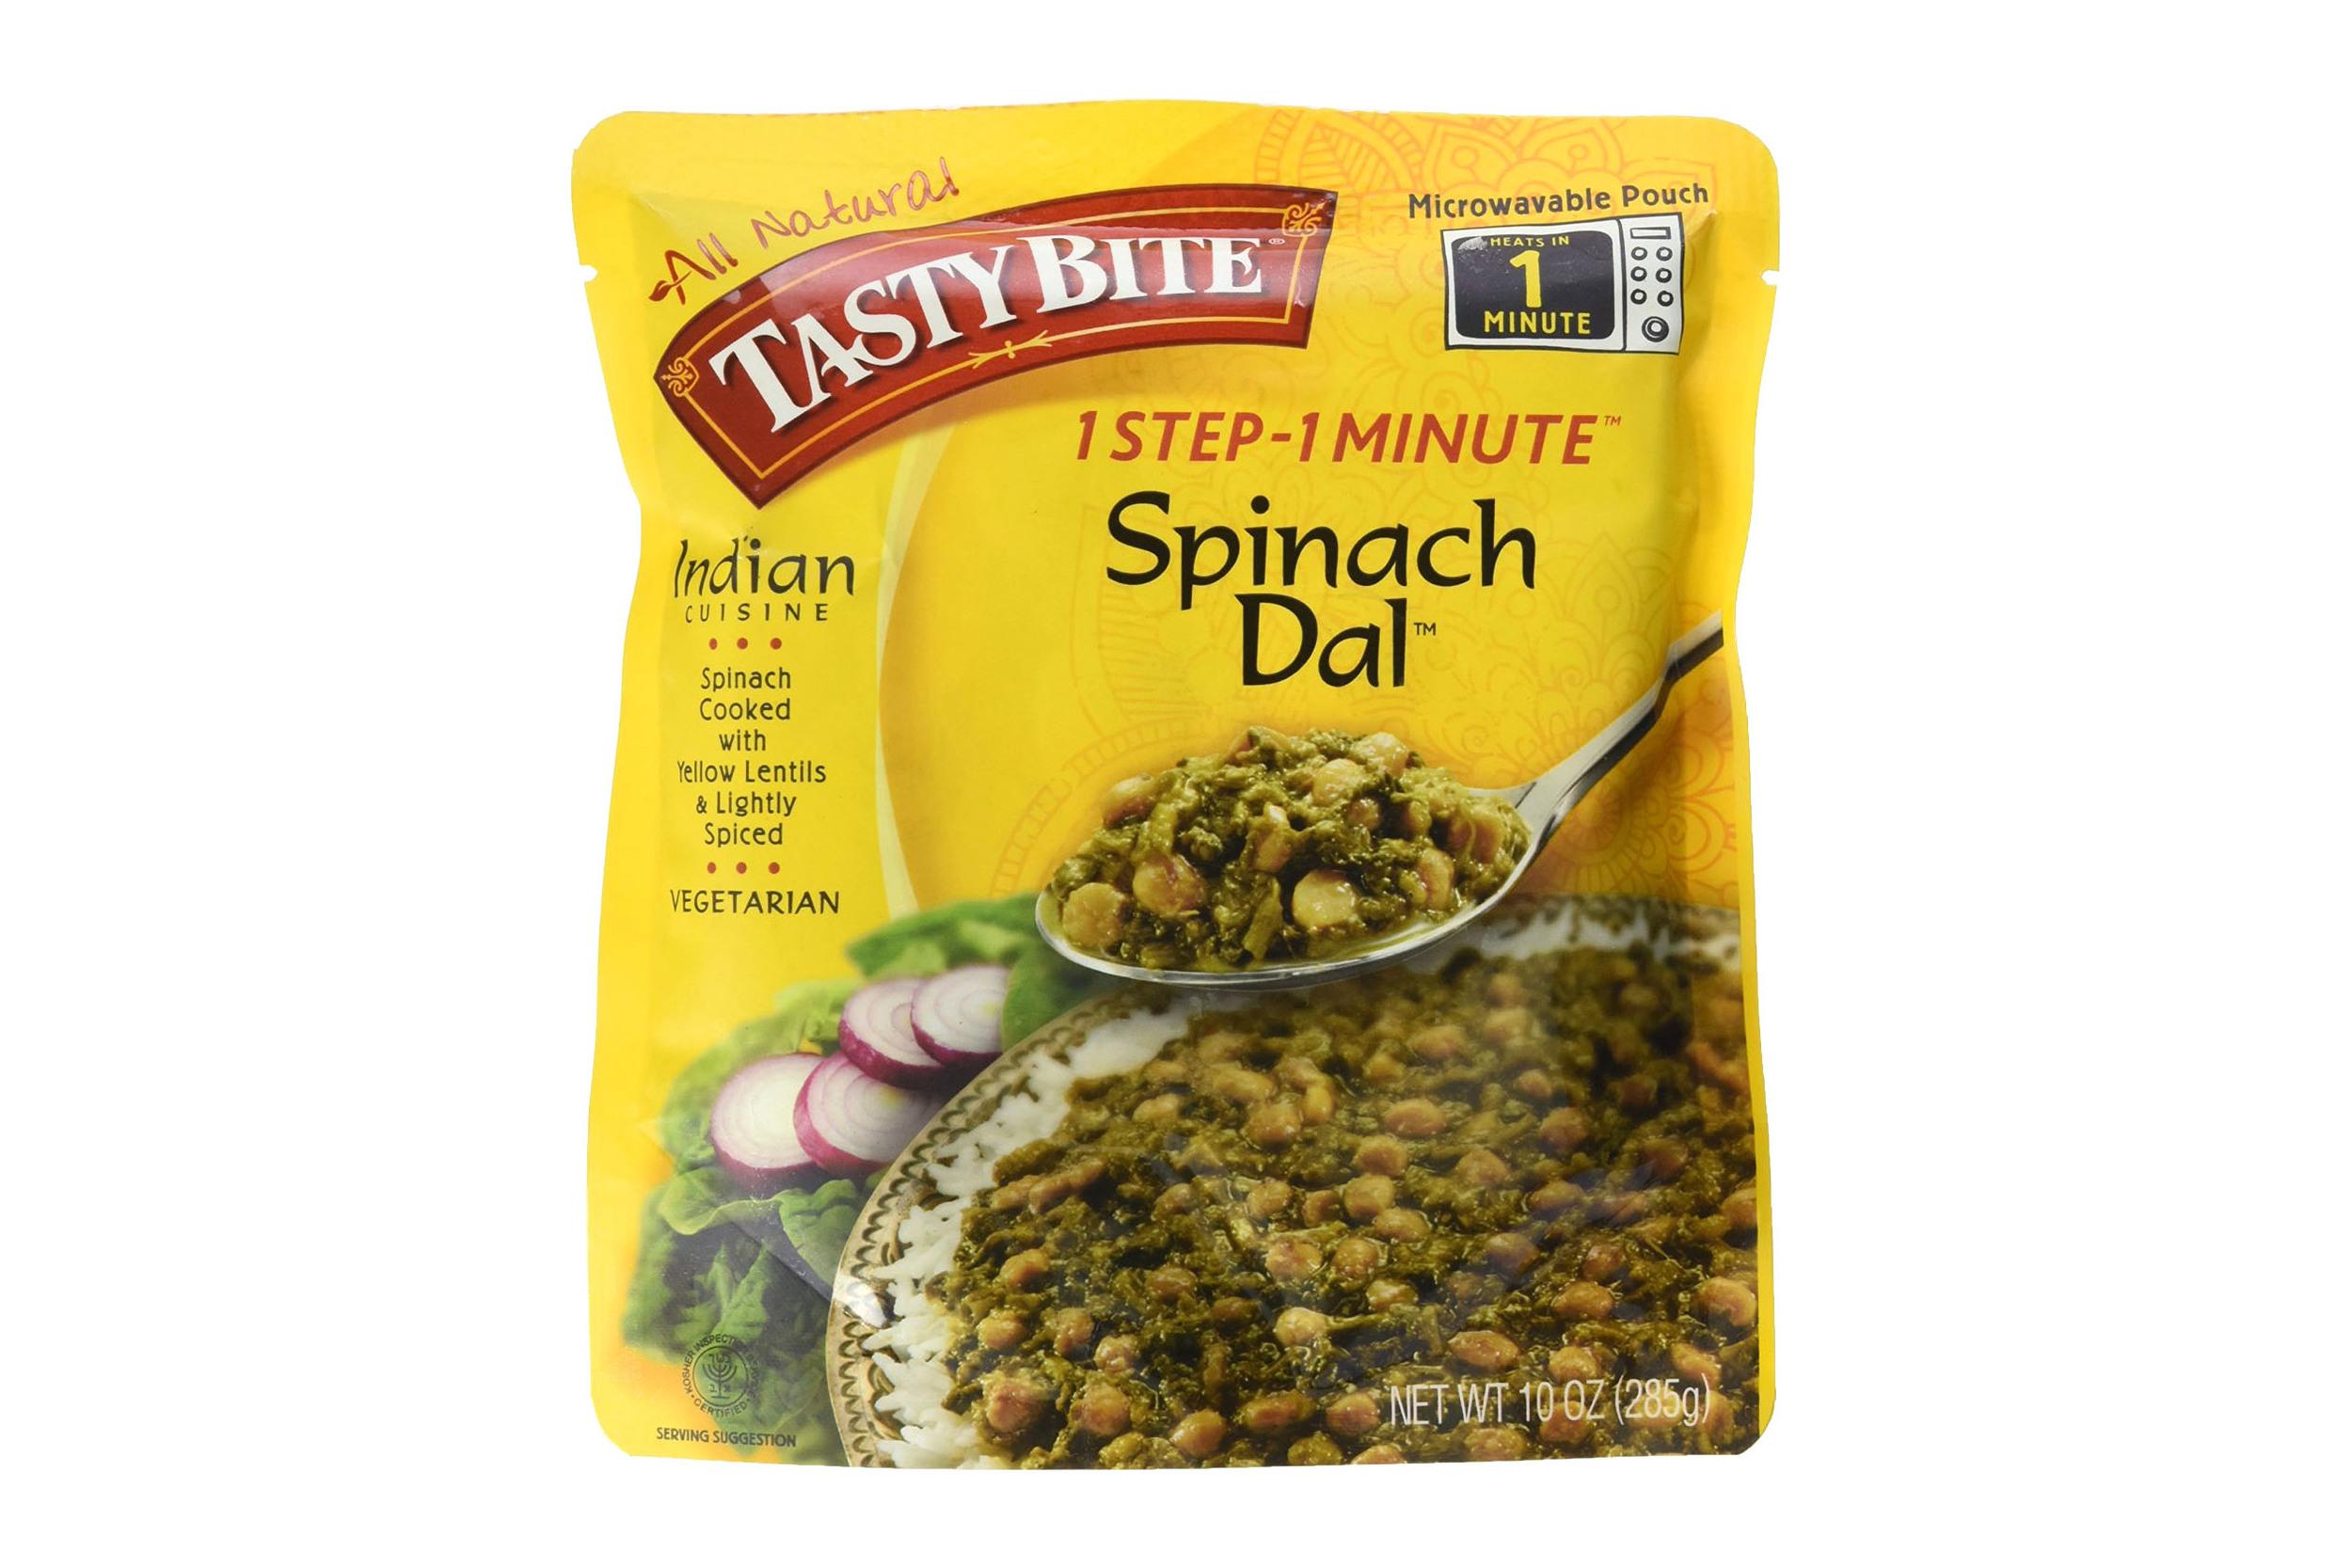 Spinach Dal - 4.5 stars - $4 (Prime Pantry)